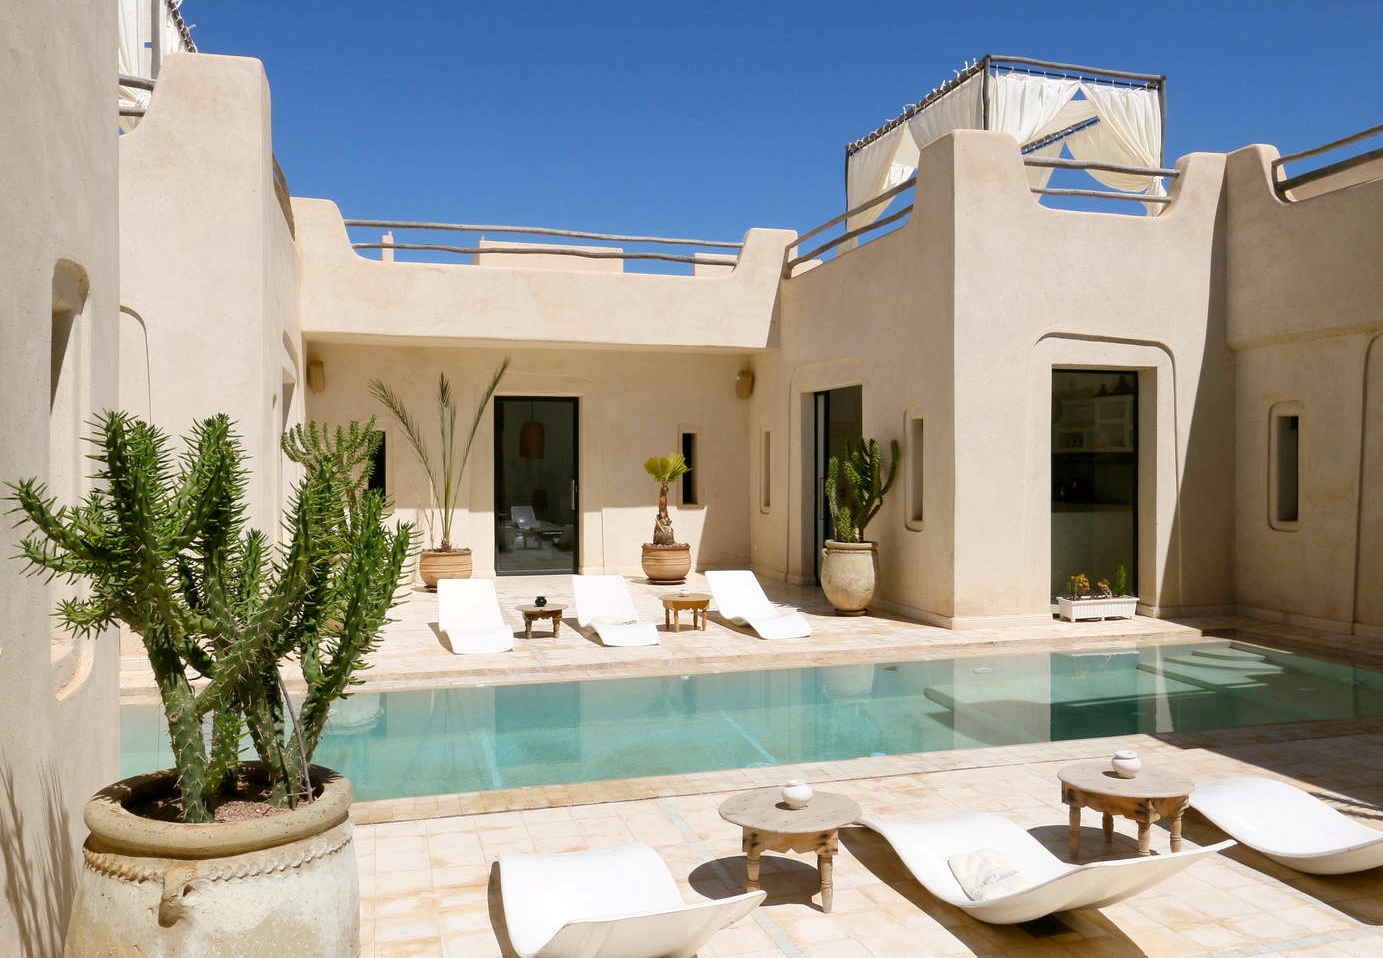 Location maison vacances avec piscine priv e Location maison avec piscine marrakech